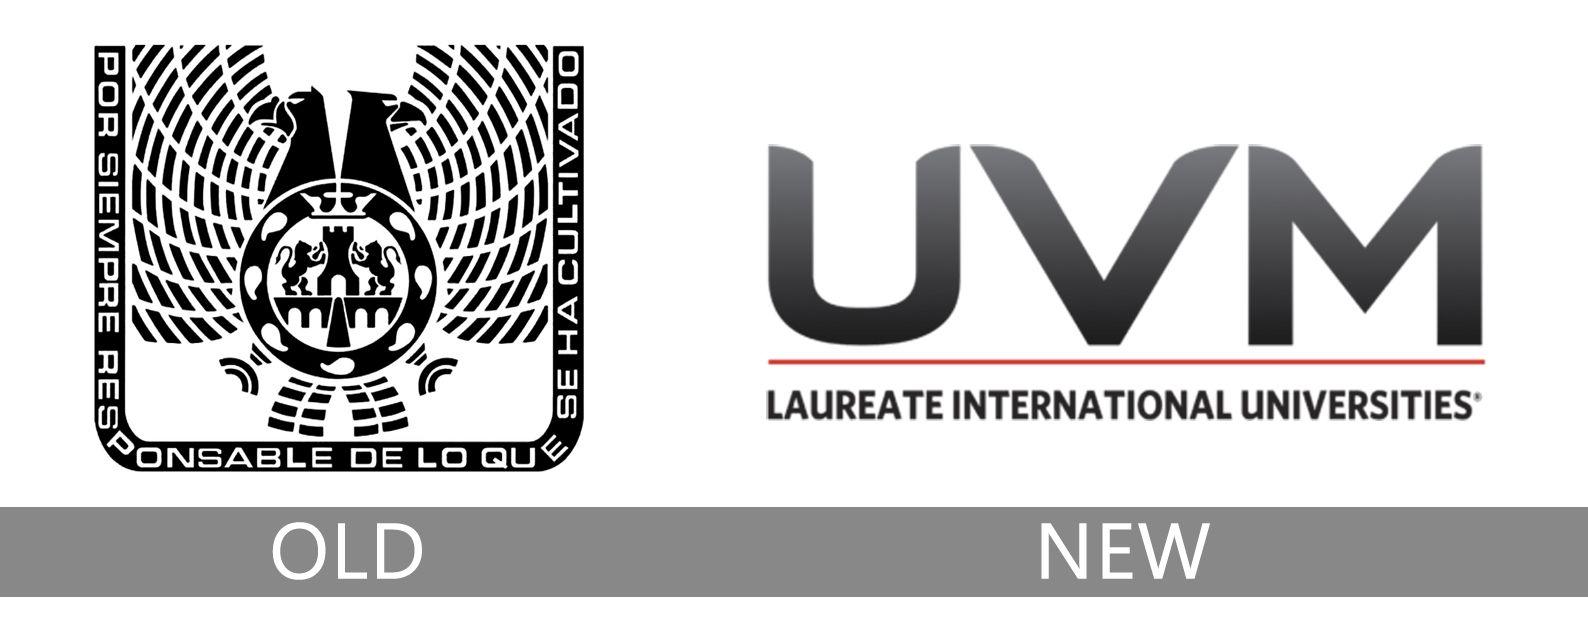 UVM logo history | All logos world | Logos, Mexico, Nintendo